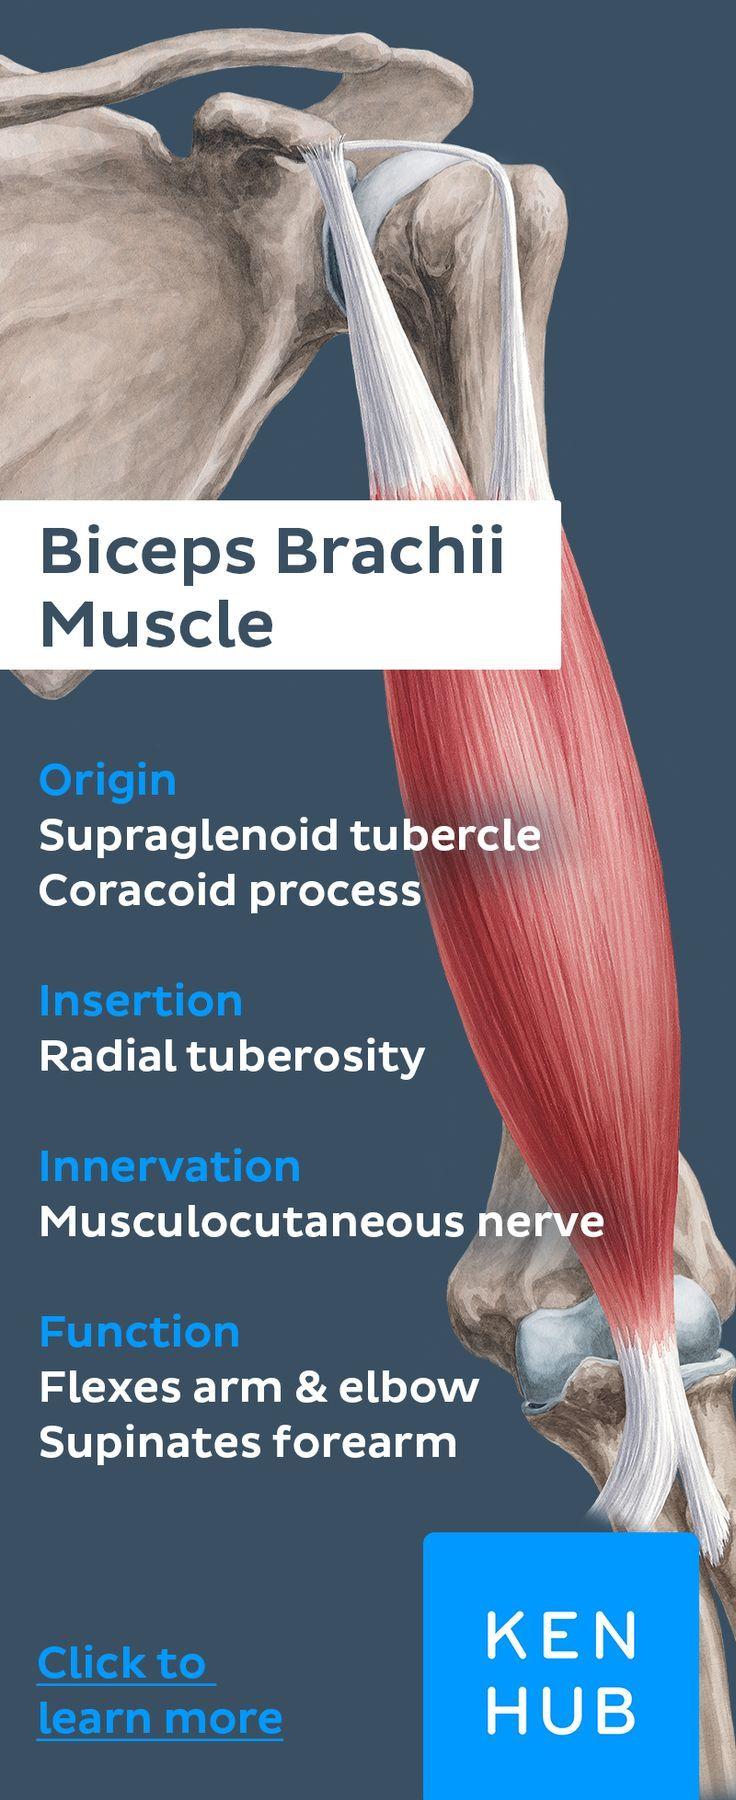 Biceps Brachii Muscle Frozen Shoulder Pinterest Biceps